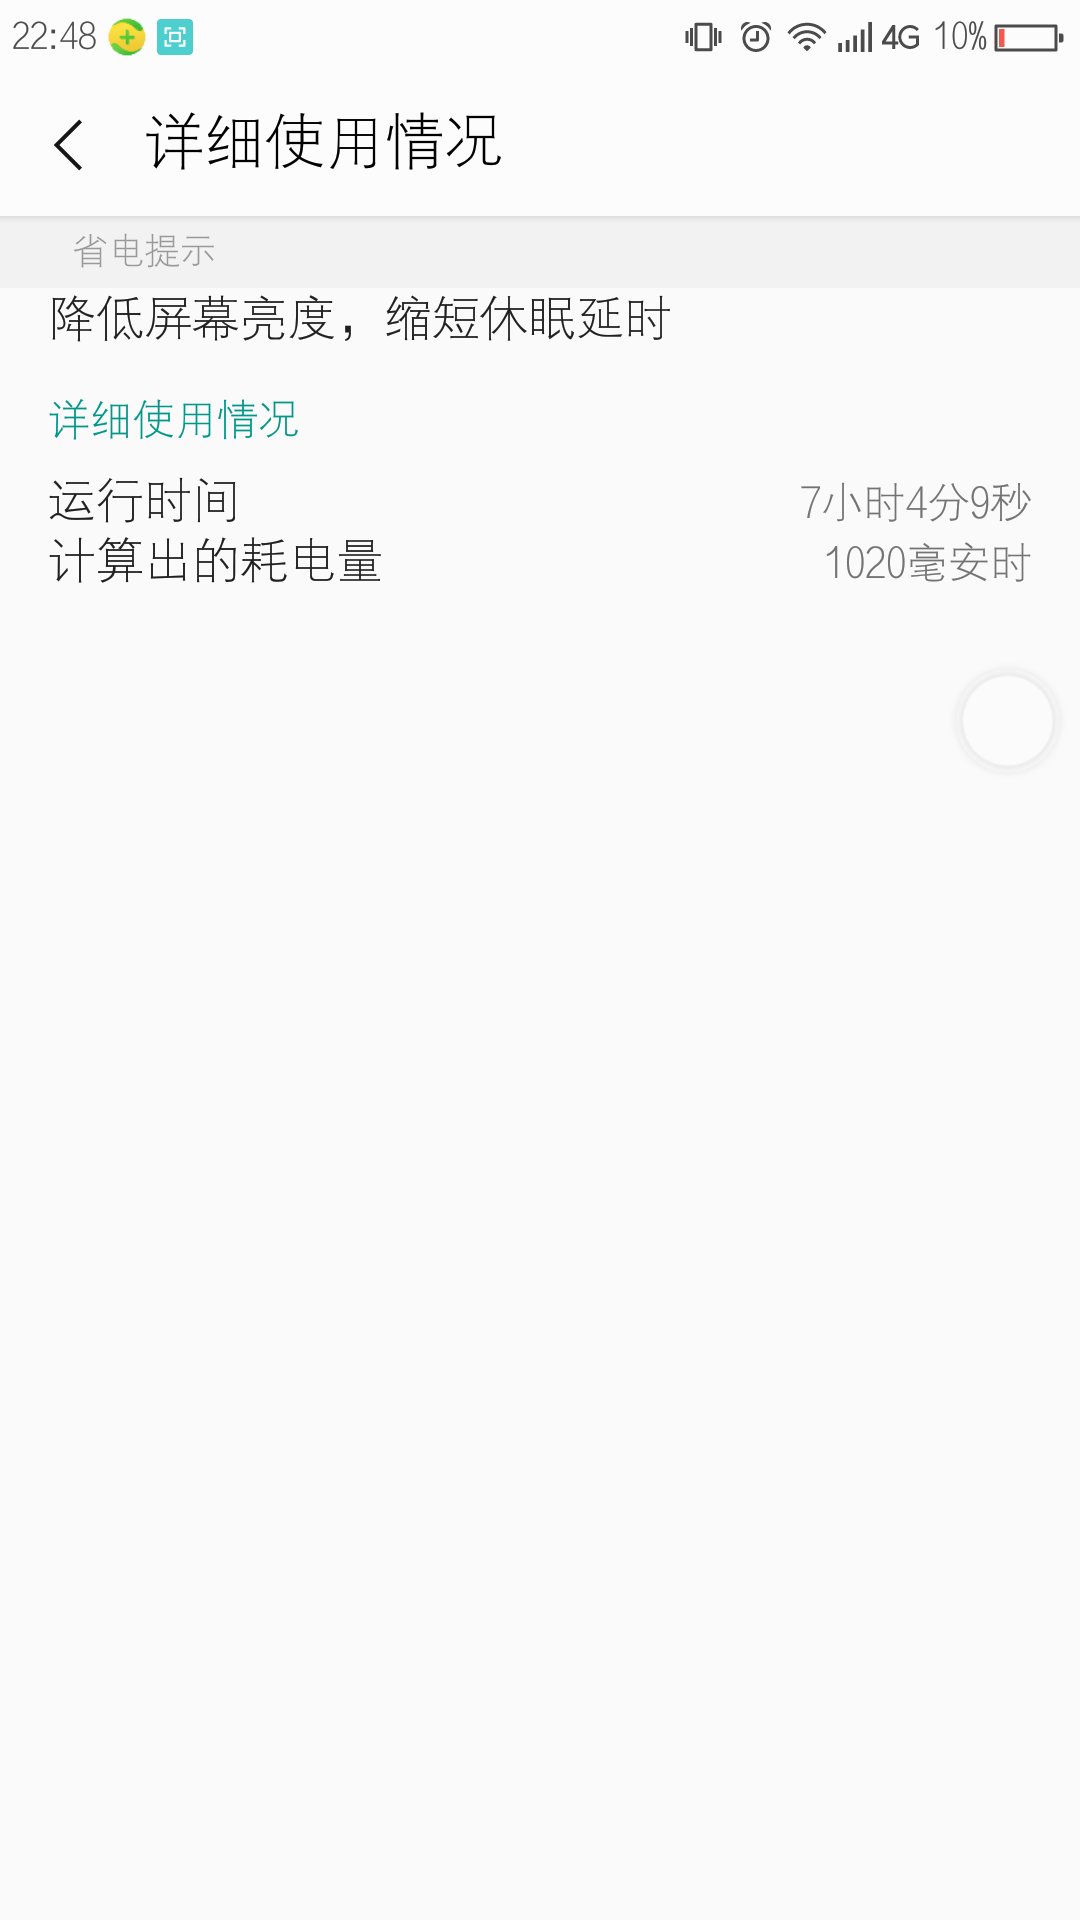 Screenshot_2016-09-06-22-48-54.png